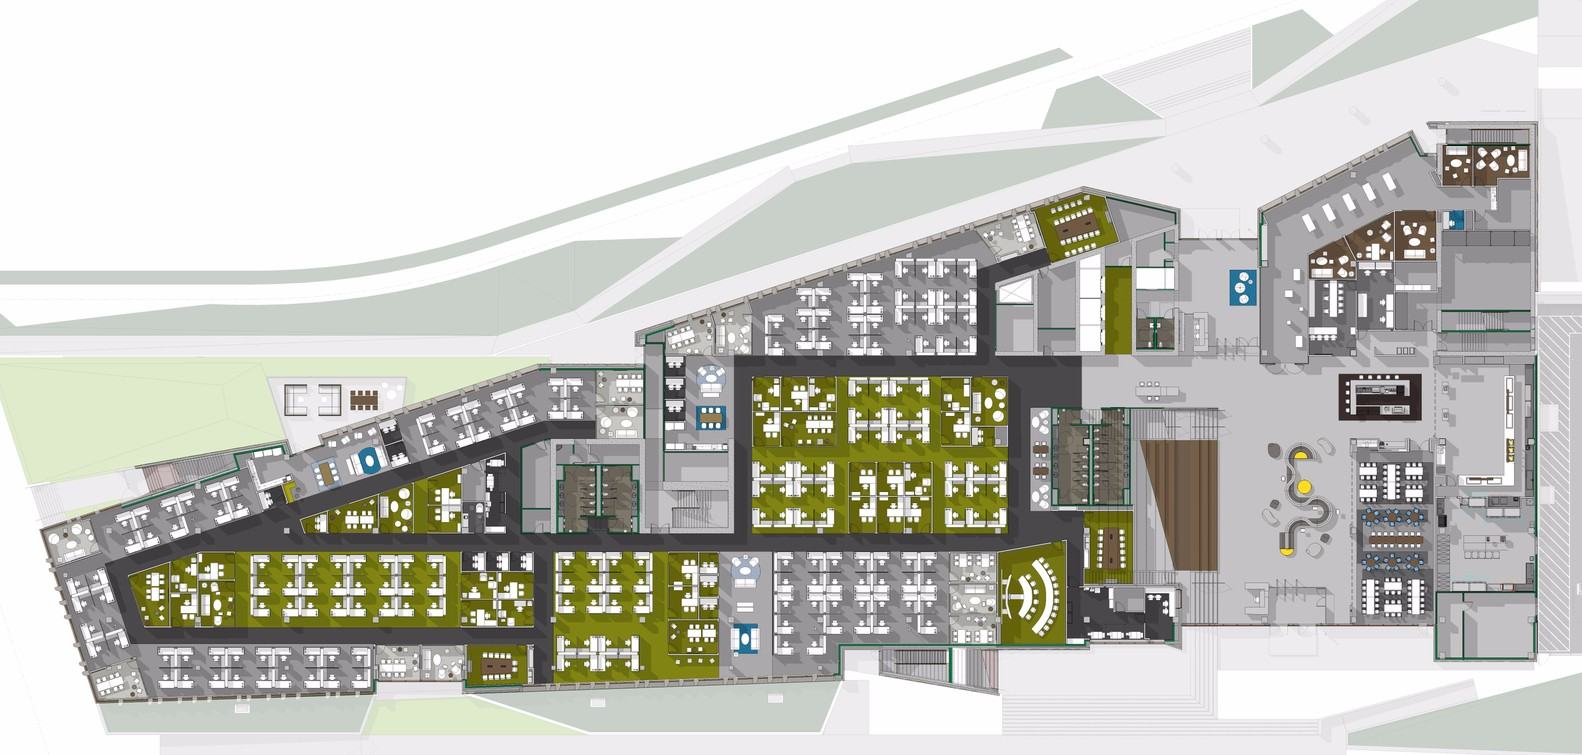 Intuit海洋路大廈——探索可持續的公共參與型發展模式插图18